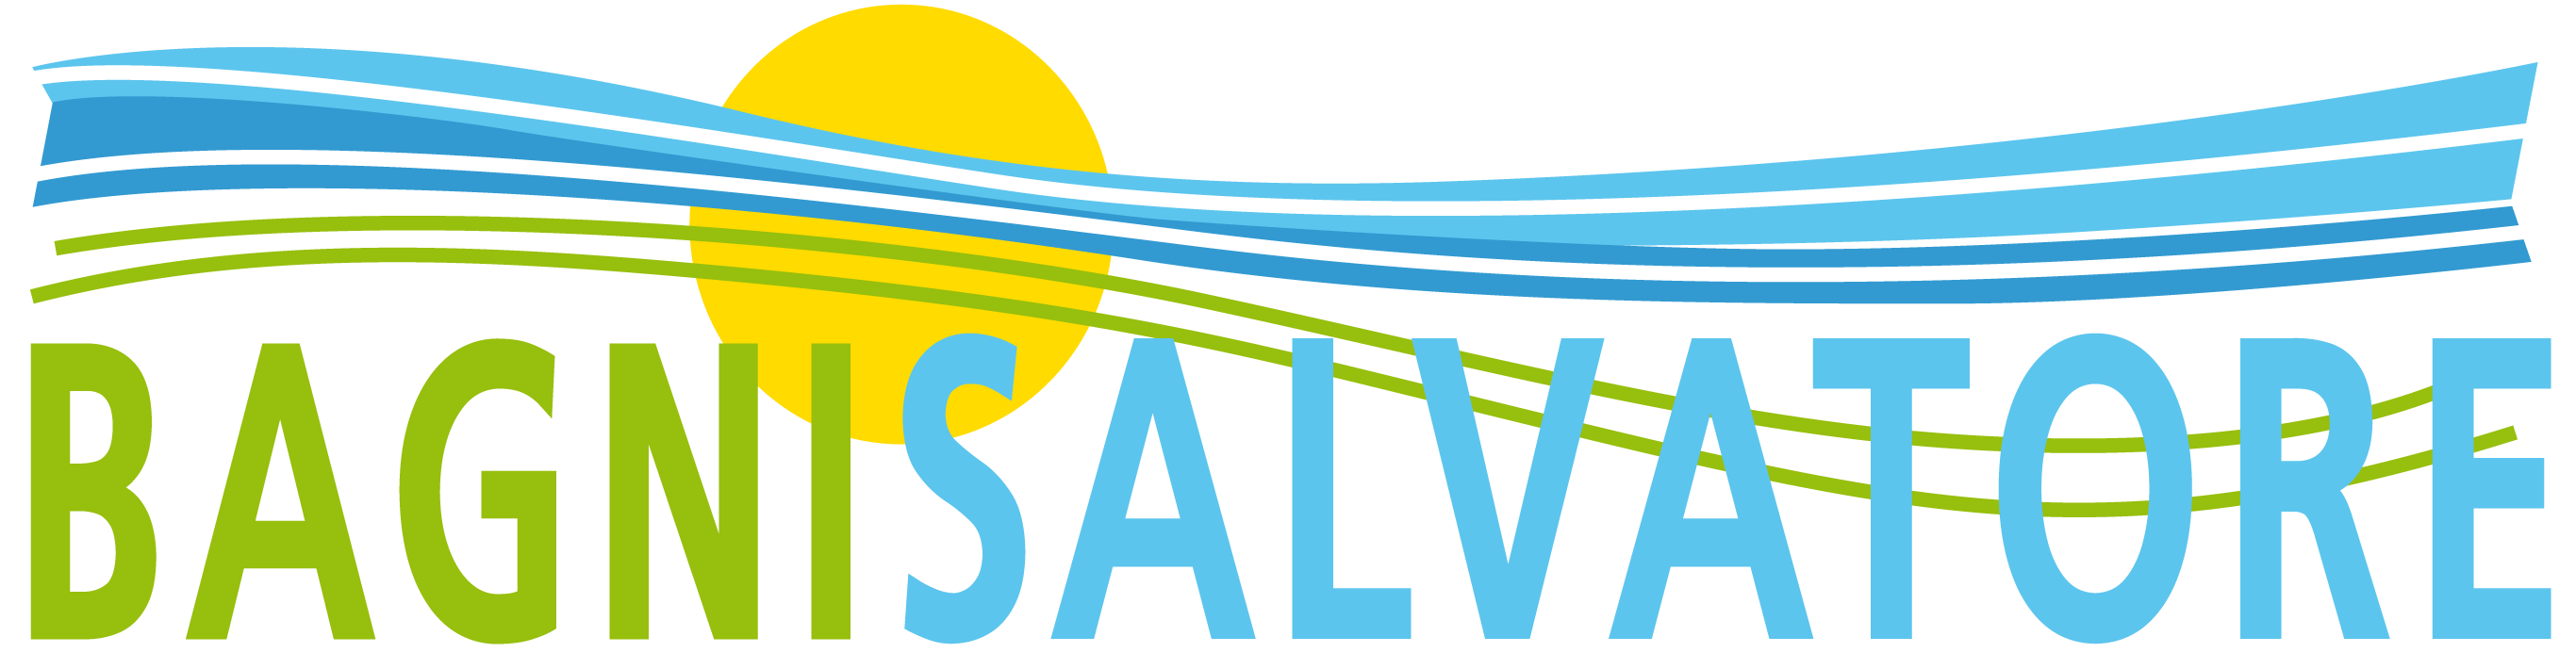 Bagni salvatore